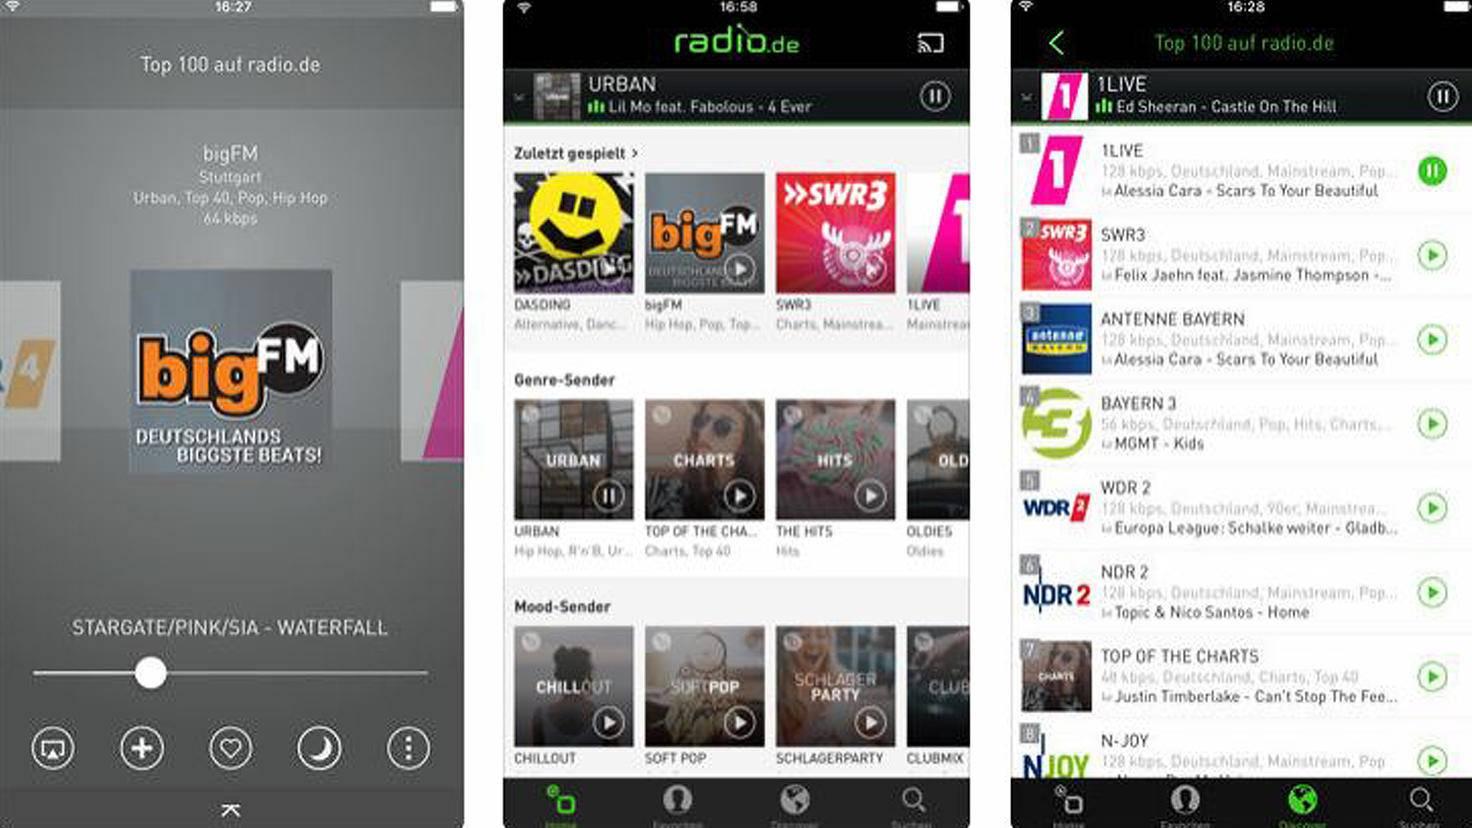 radio-de-iTunes-radio-de GmbH